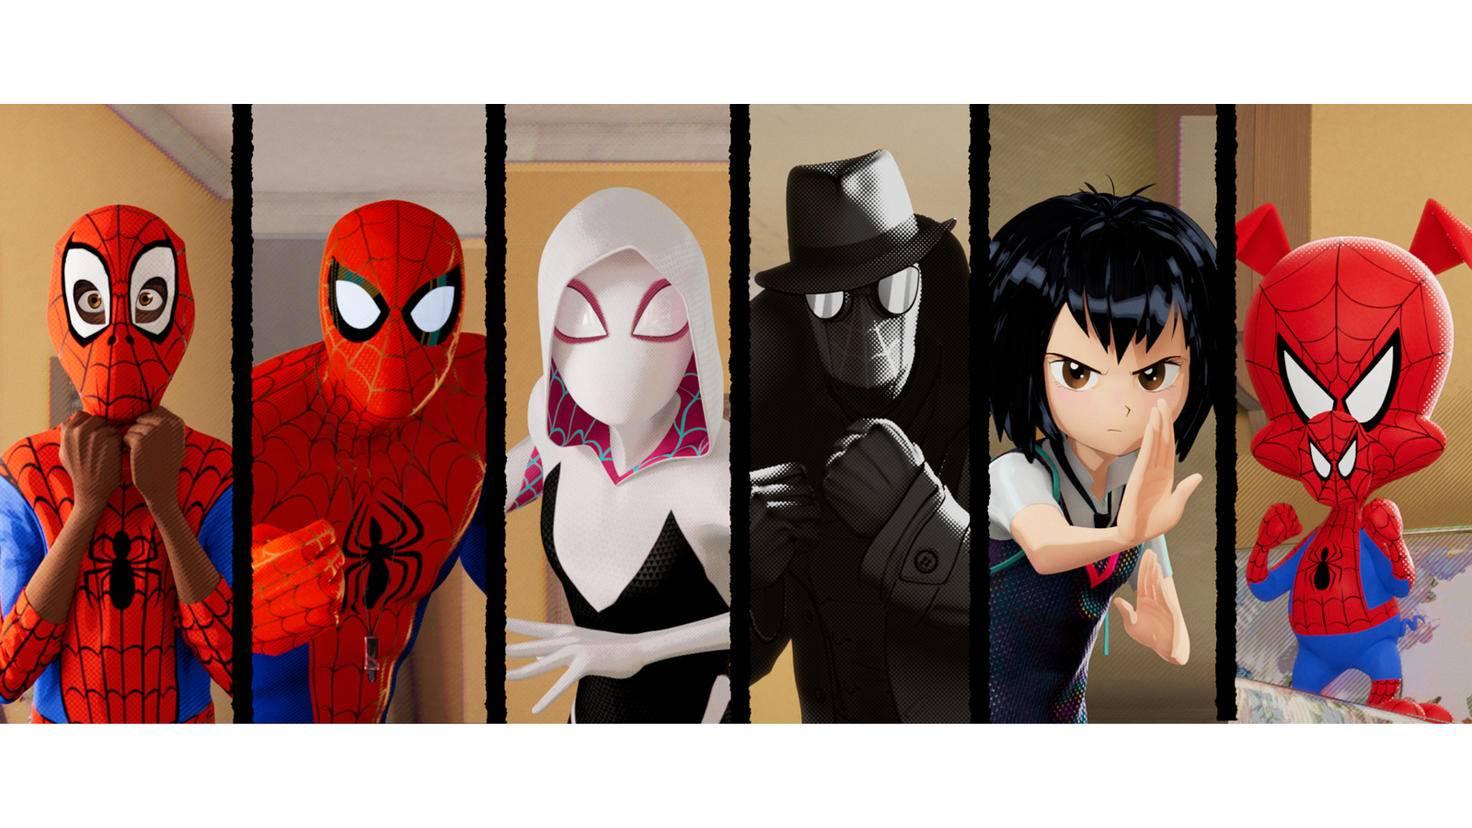 Spider-Man A New Universe Szenenbild 2 Sony Pictures Home Entertainment